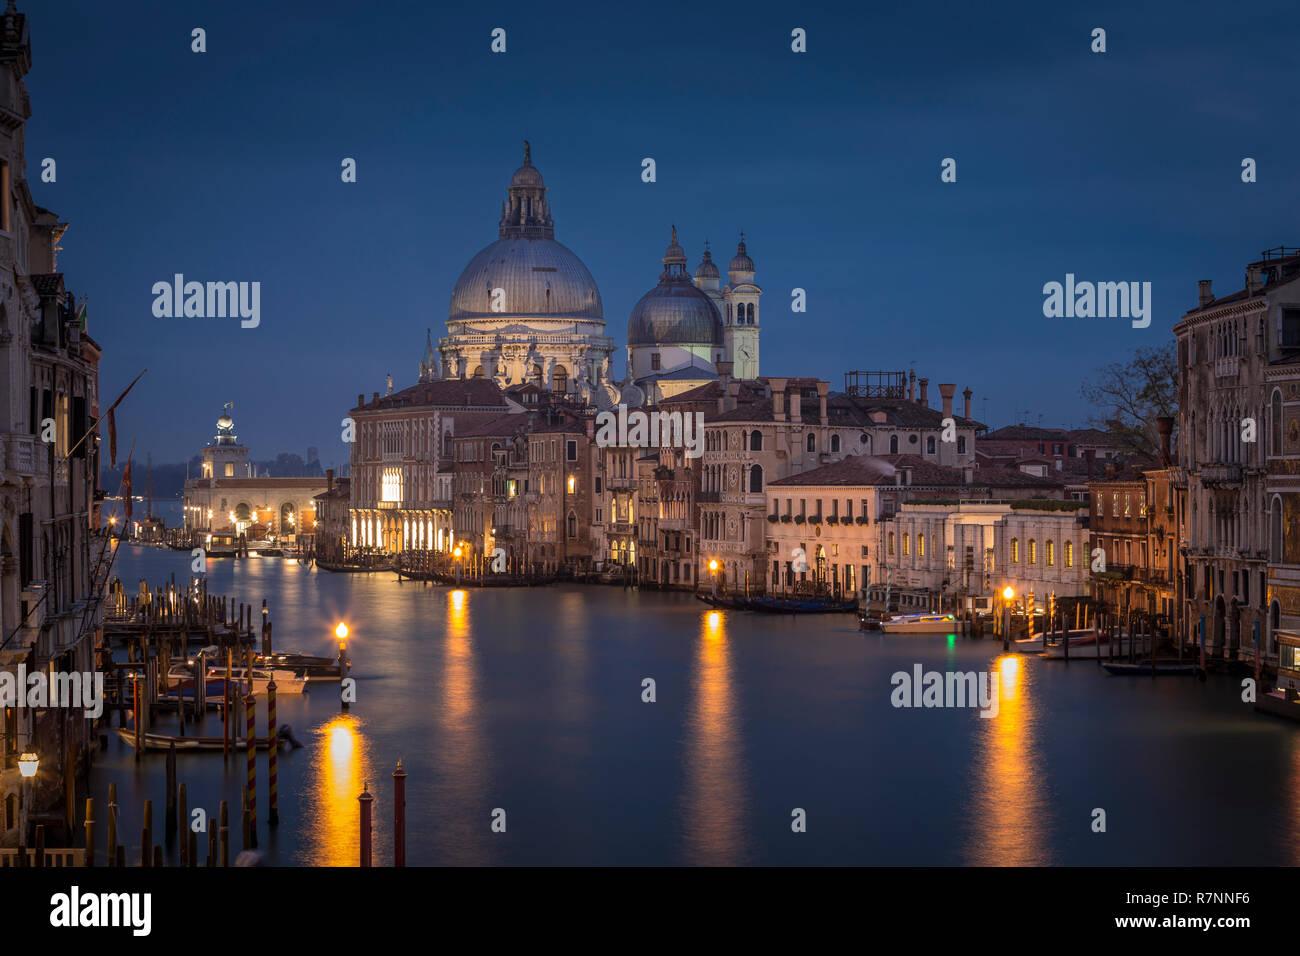 Canal Grande mit Santa Maria della Salute Kirche bei Nacht von Accademia Brücke, Venedig, Italien Stockfoto